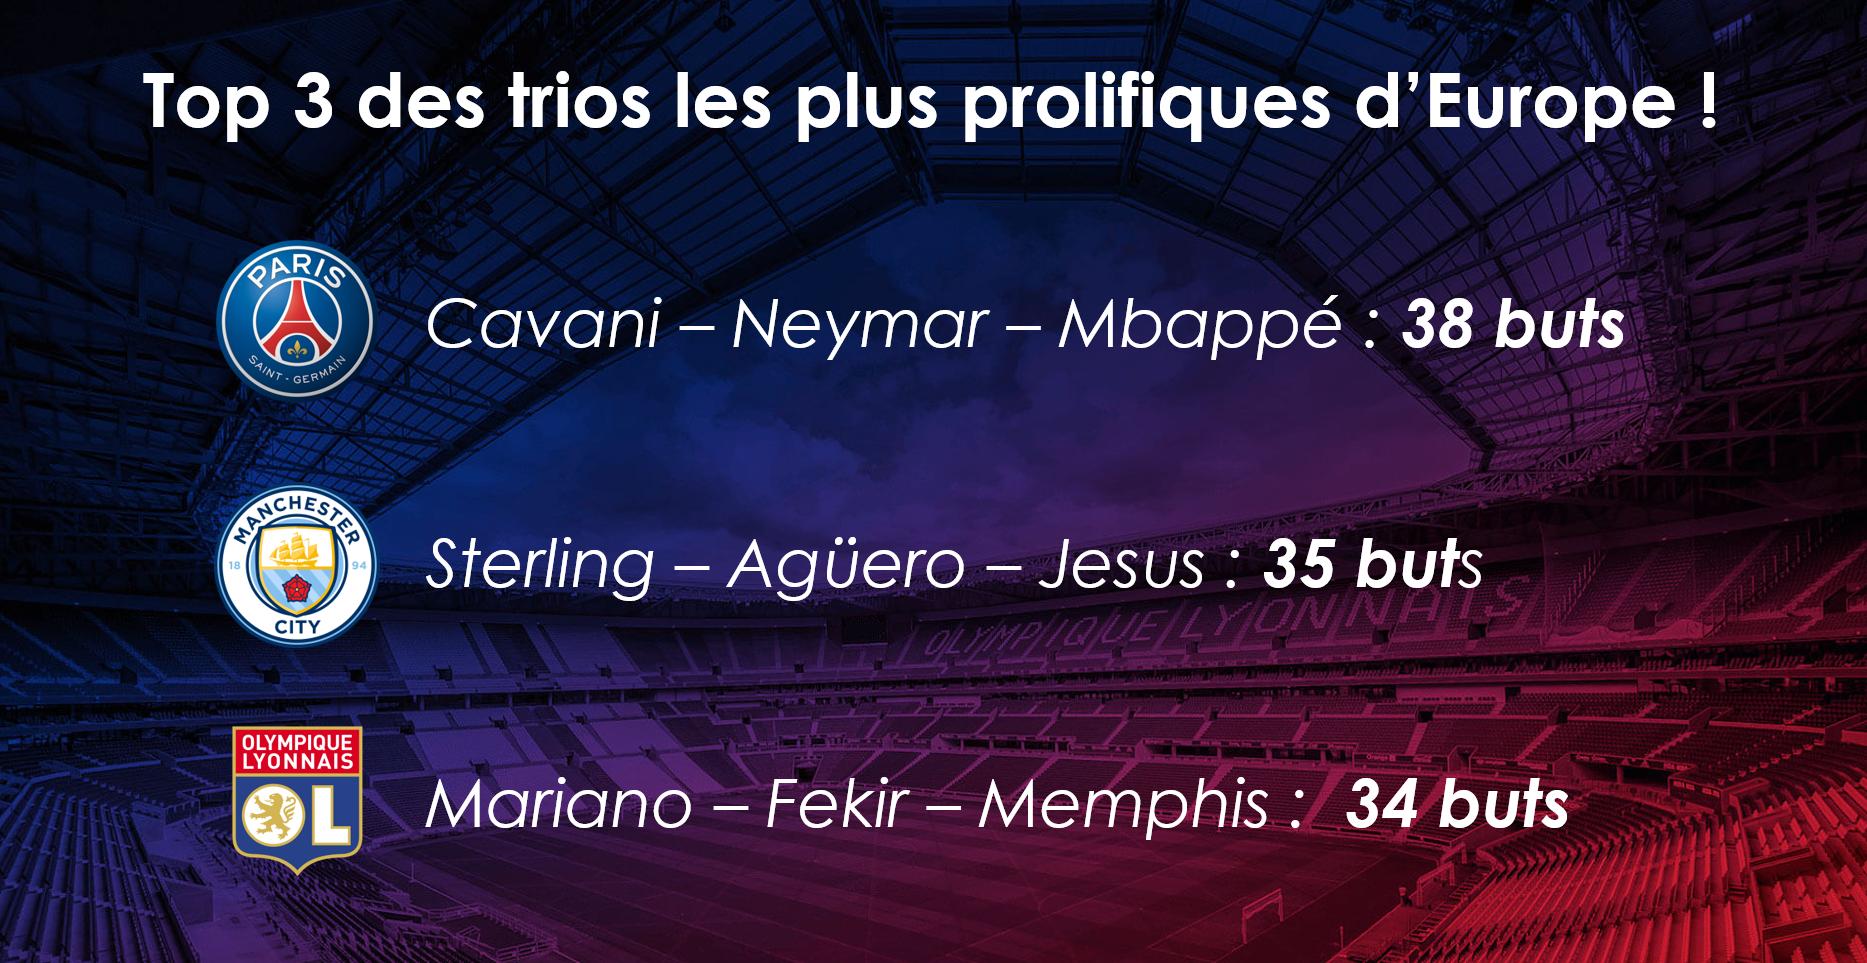 Top 3 des trios d'europe